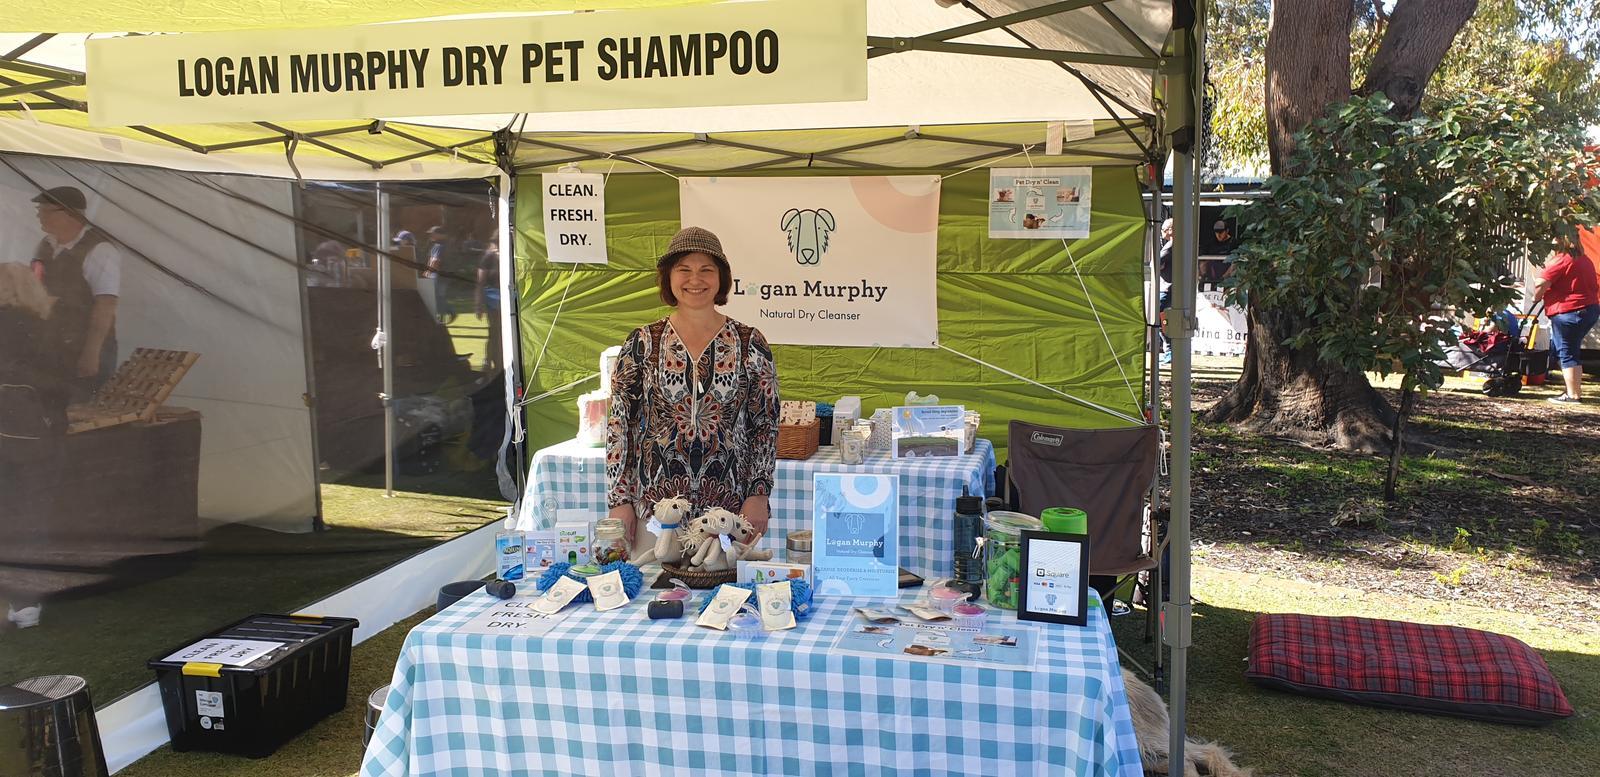 Logan Murphy Natural Dry Pet Shampoo